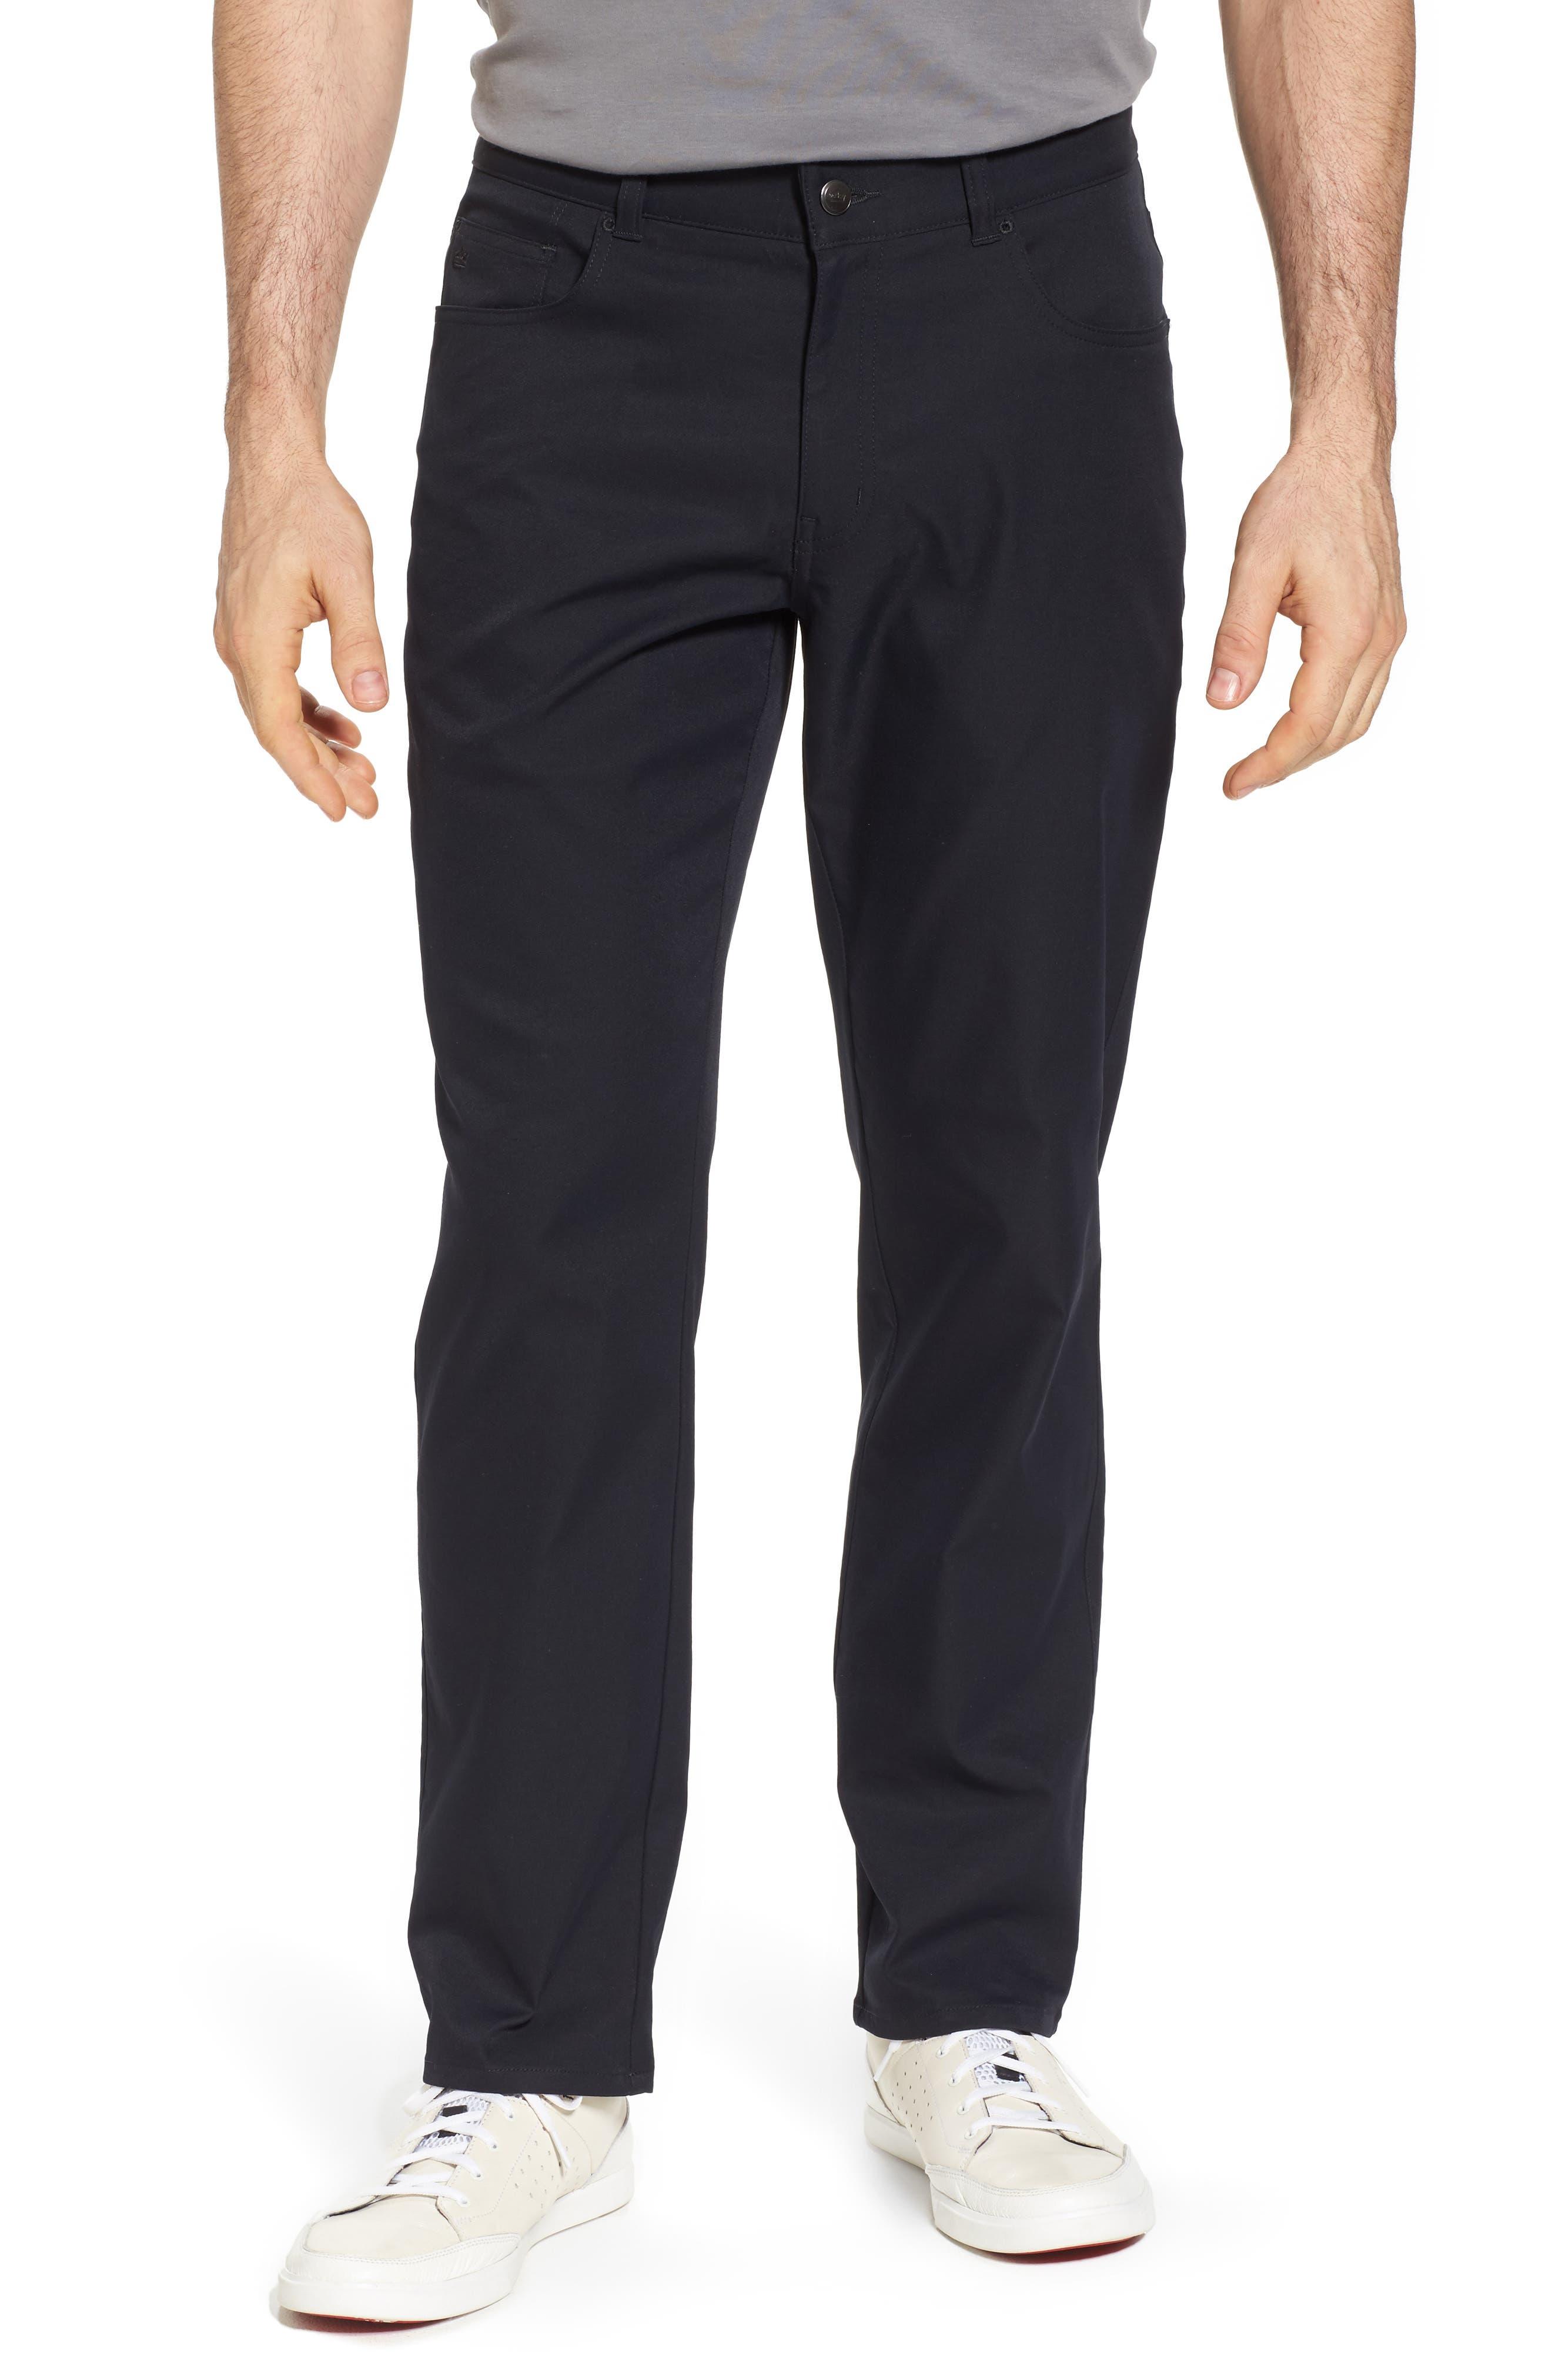 EB66 Performance Six-Pocket Pants,                         Main,                         color, 001